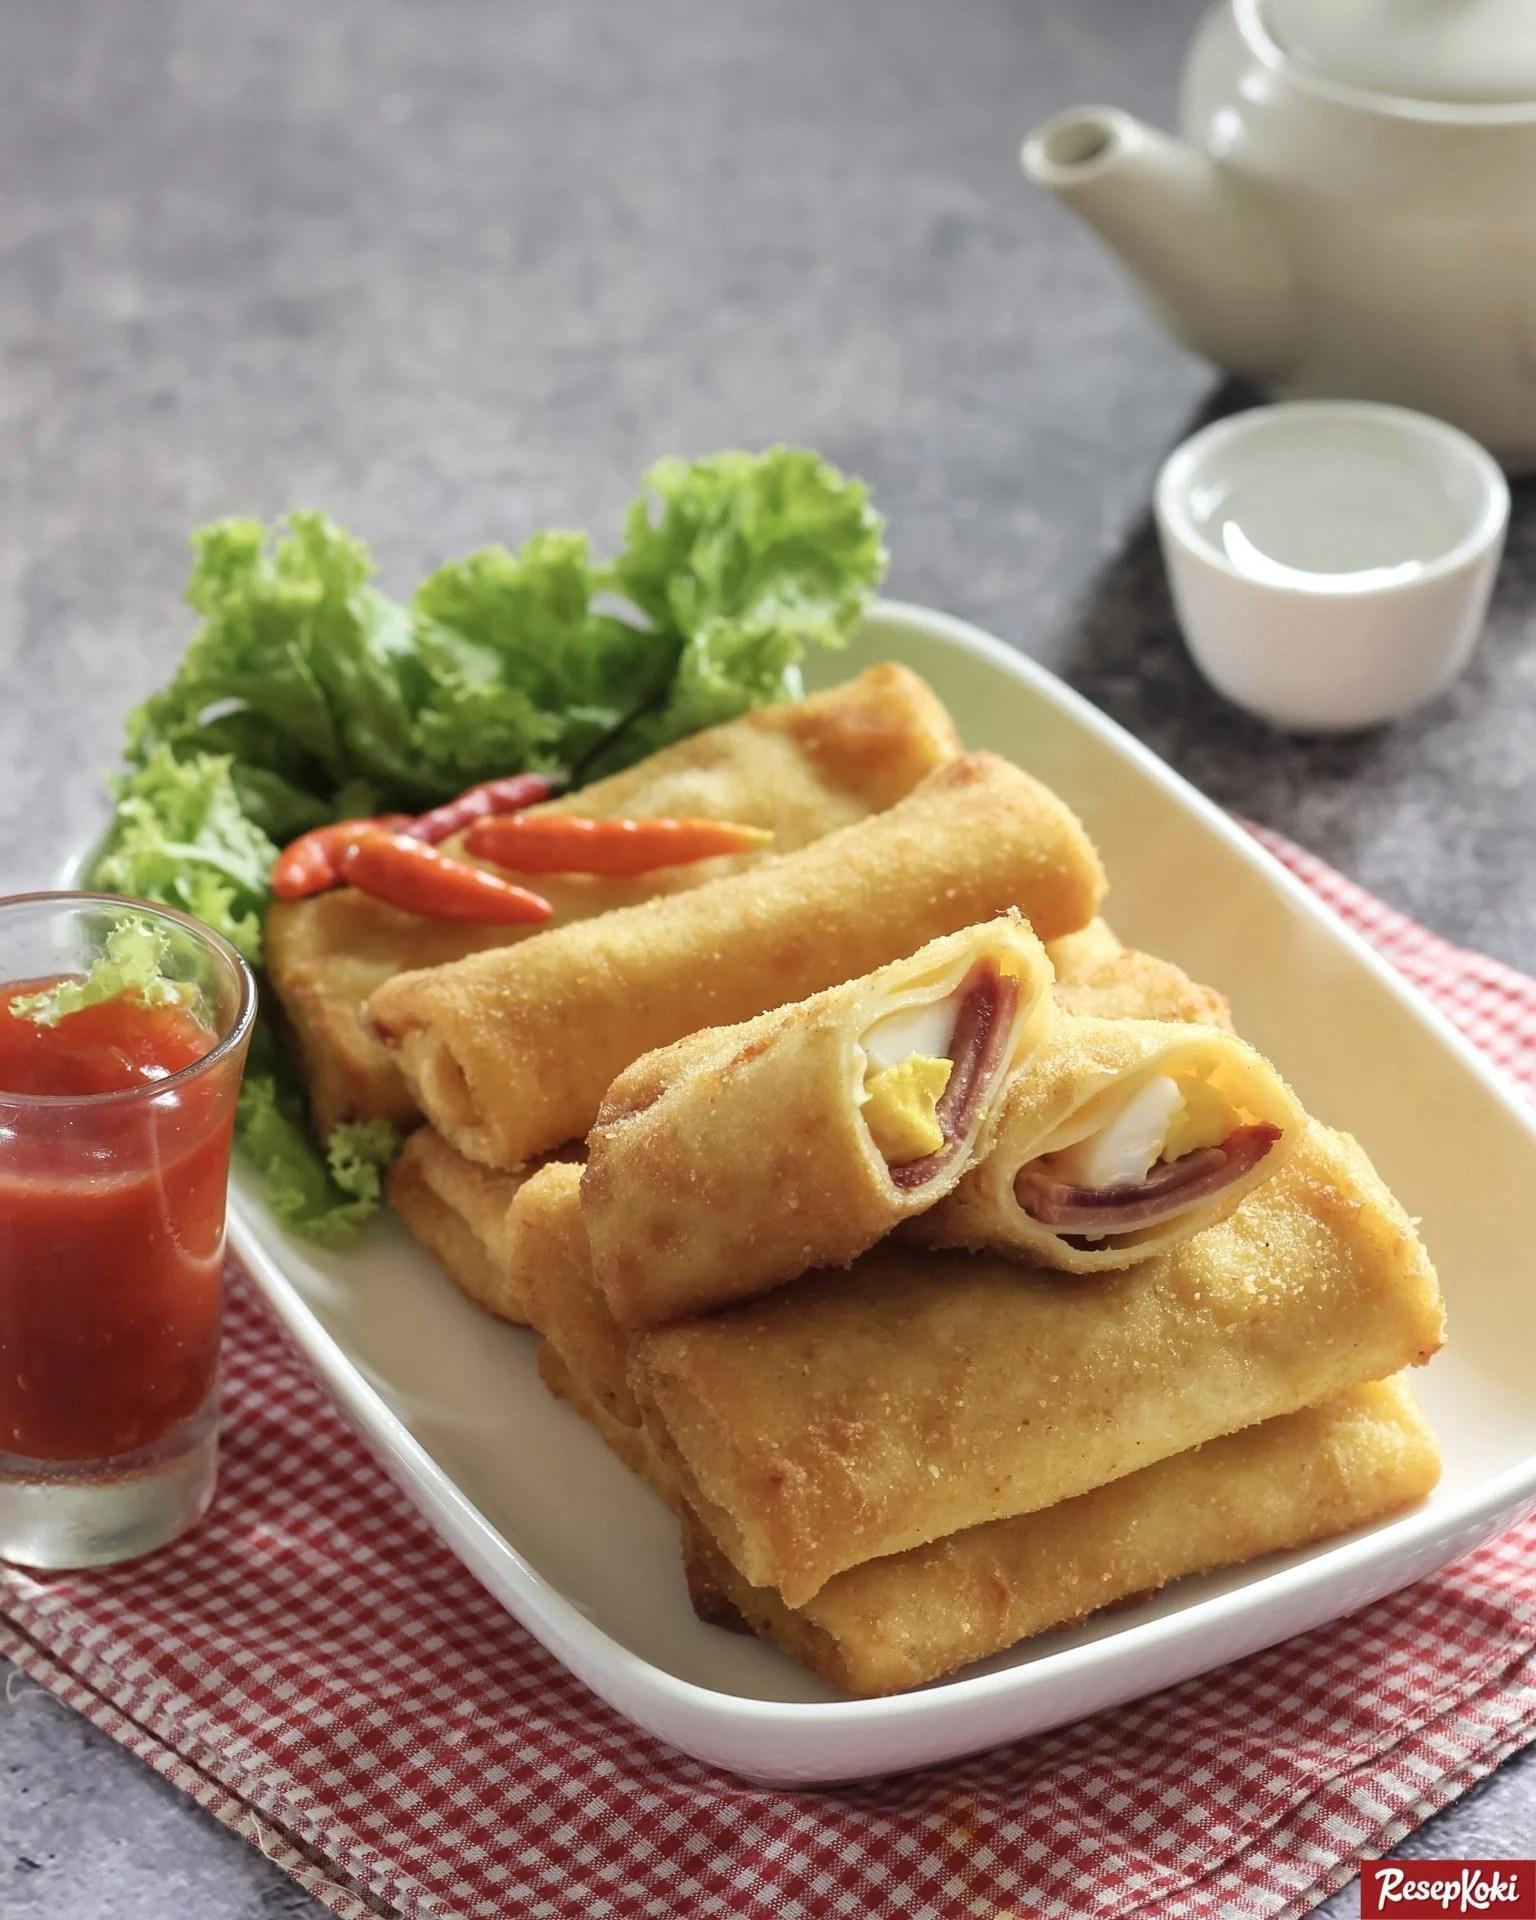 Resep Risoles Mayo : resep, risoles, Risoles, Lezat, Praktis, Resep, ResepKoki